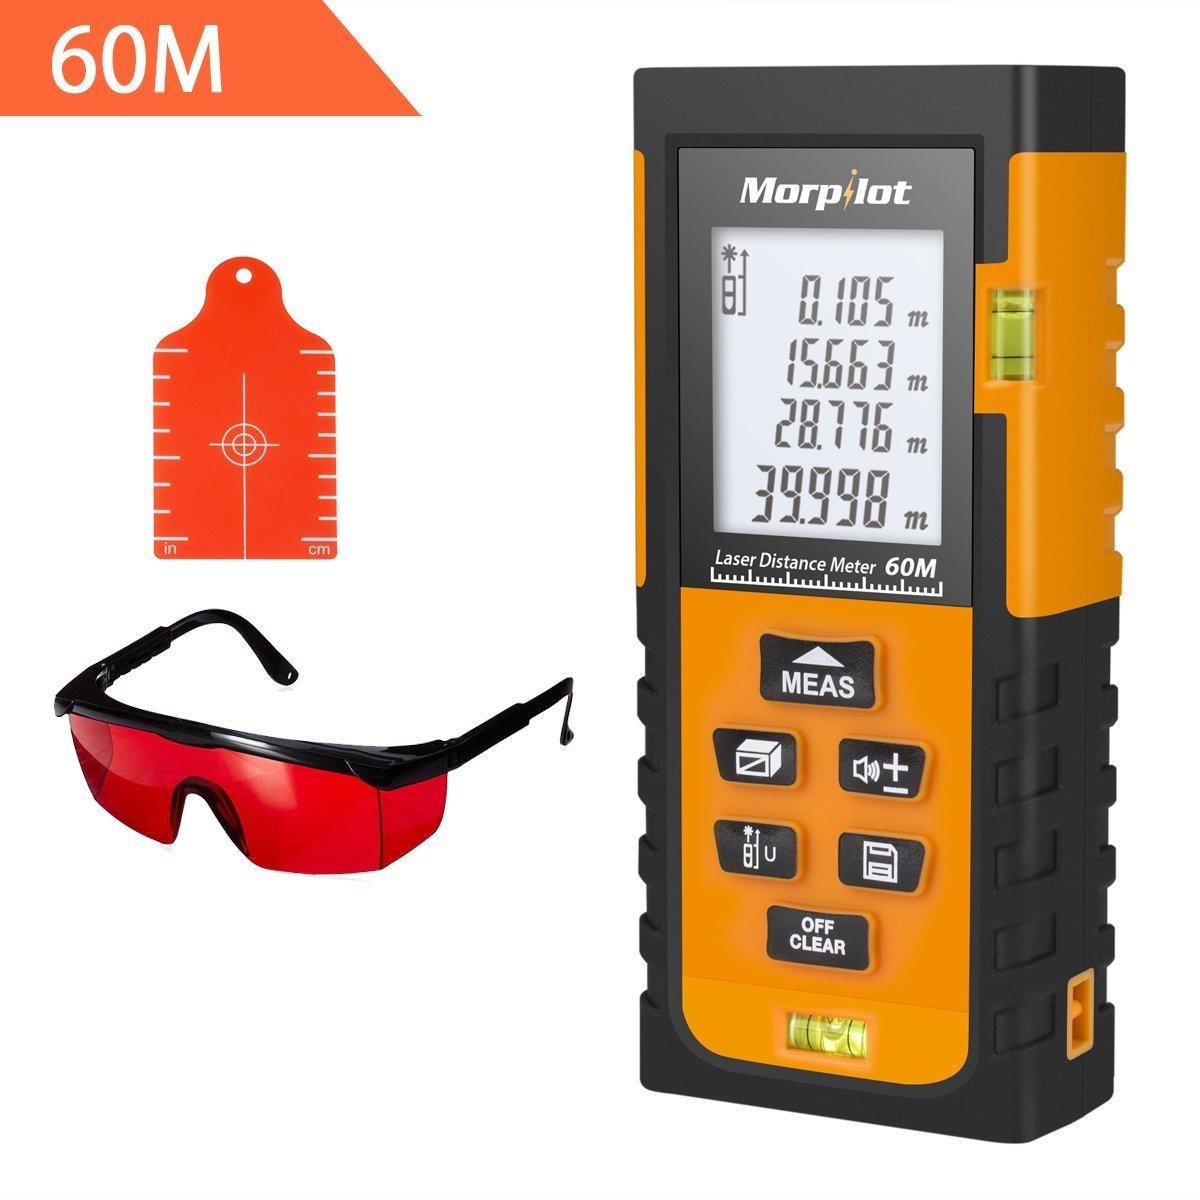 196ft Laser Measure - Morpilot Laser Tape Measure with Target Plate & Enhancing Glasses, Laser Measuring Device with Pythagorean Mode, Measure Distance, Area, Volume Calculatio (196ft)